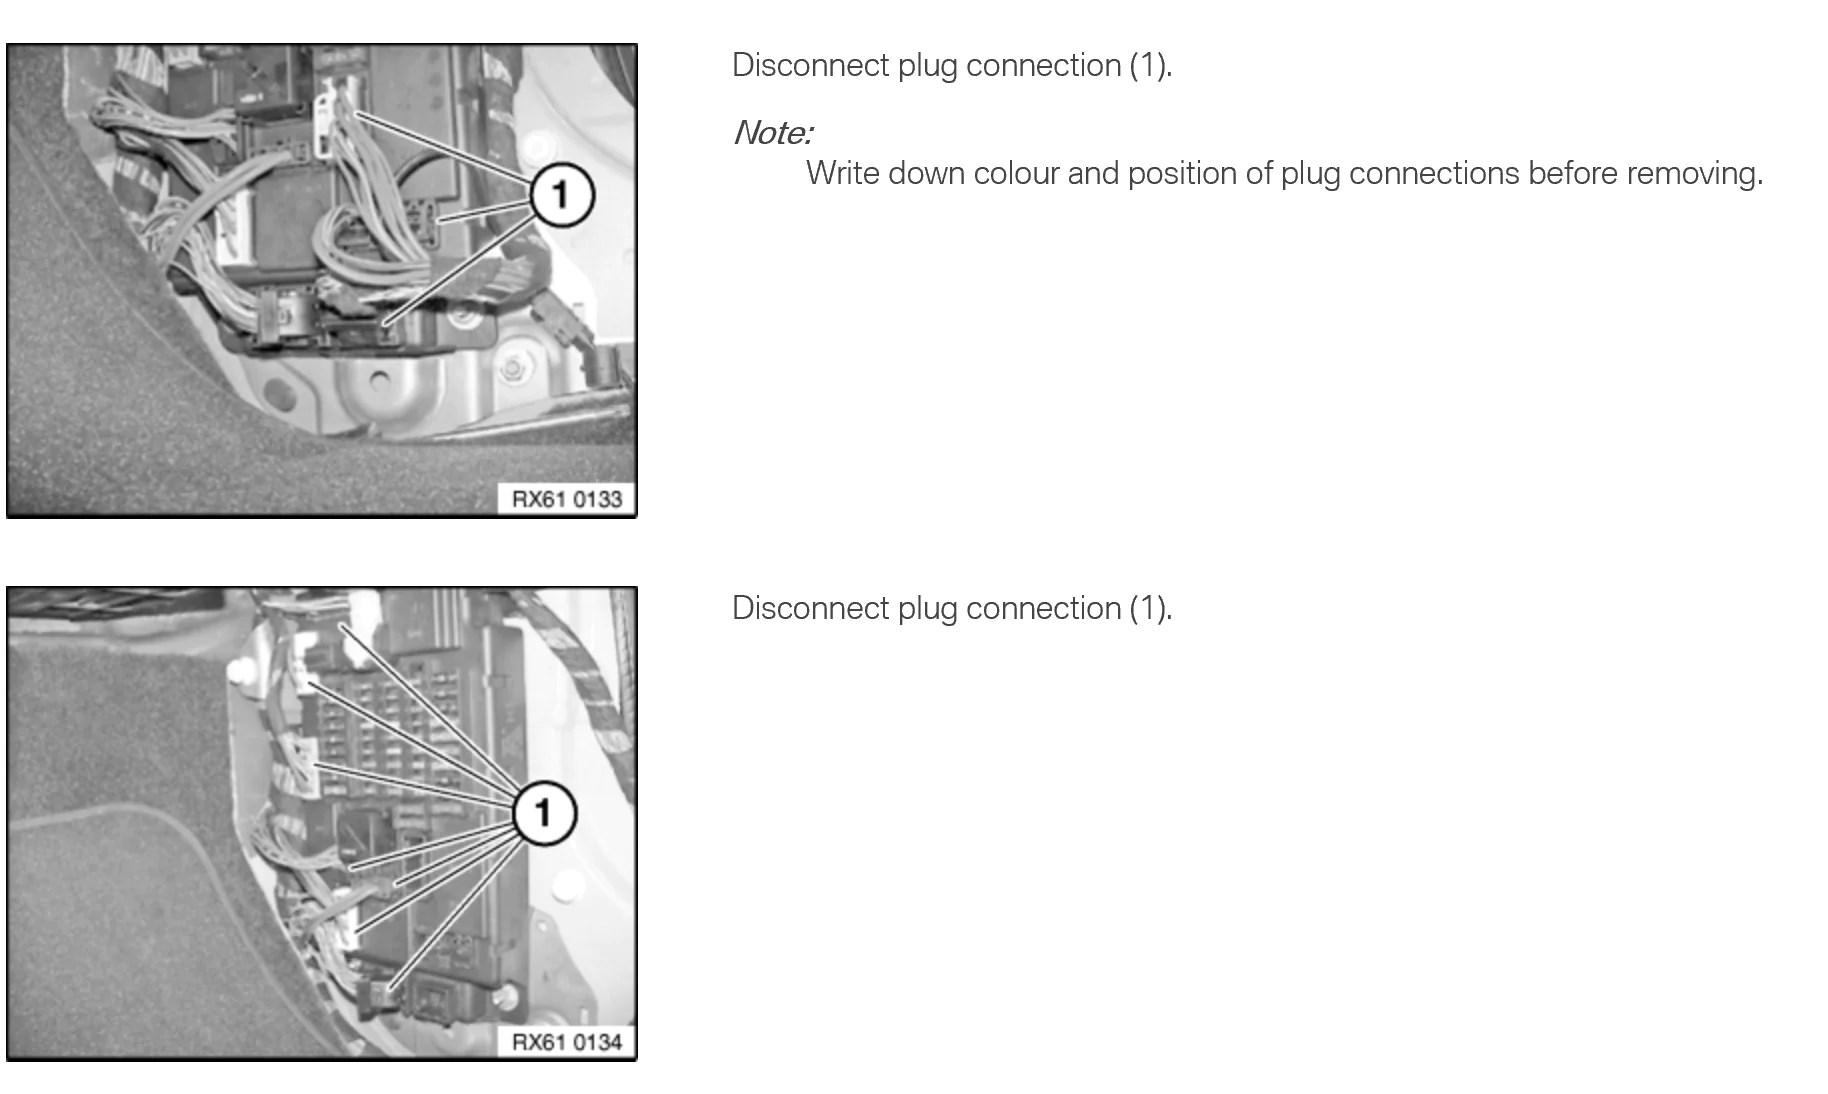 medium resolution of mini cooper r56 r58 r60 all r series fuse box speg removal instructions